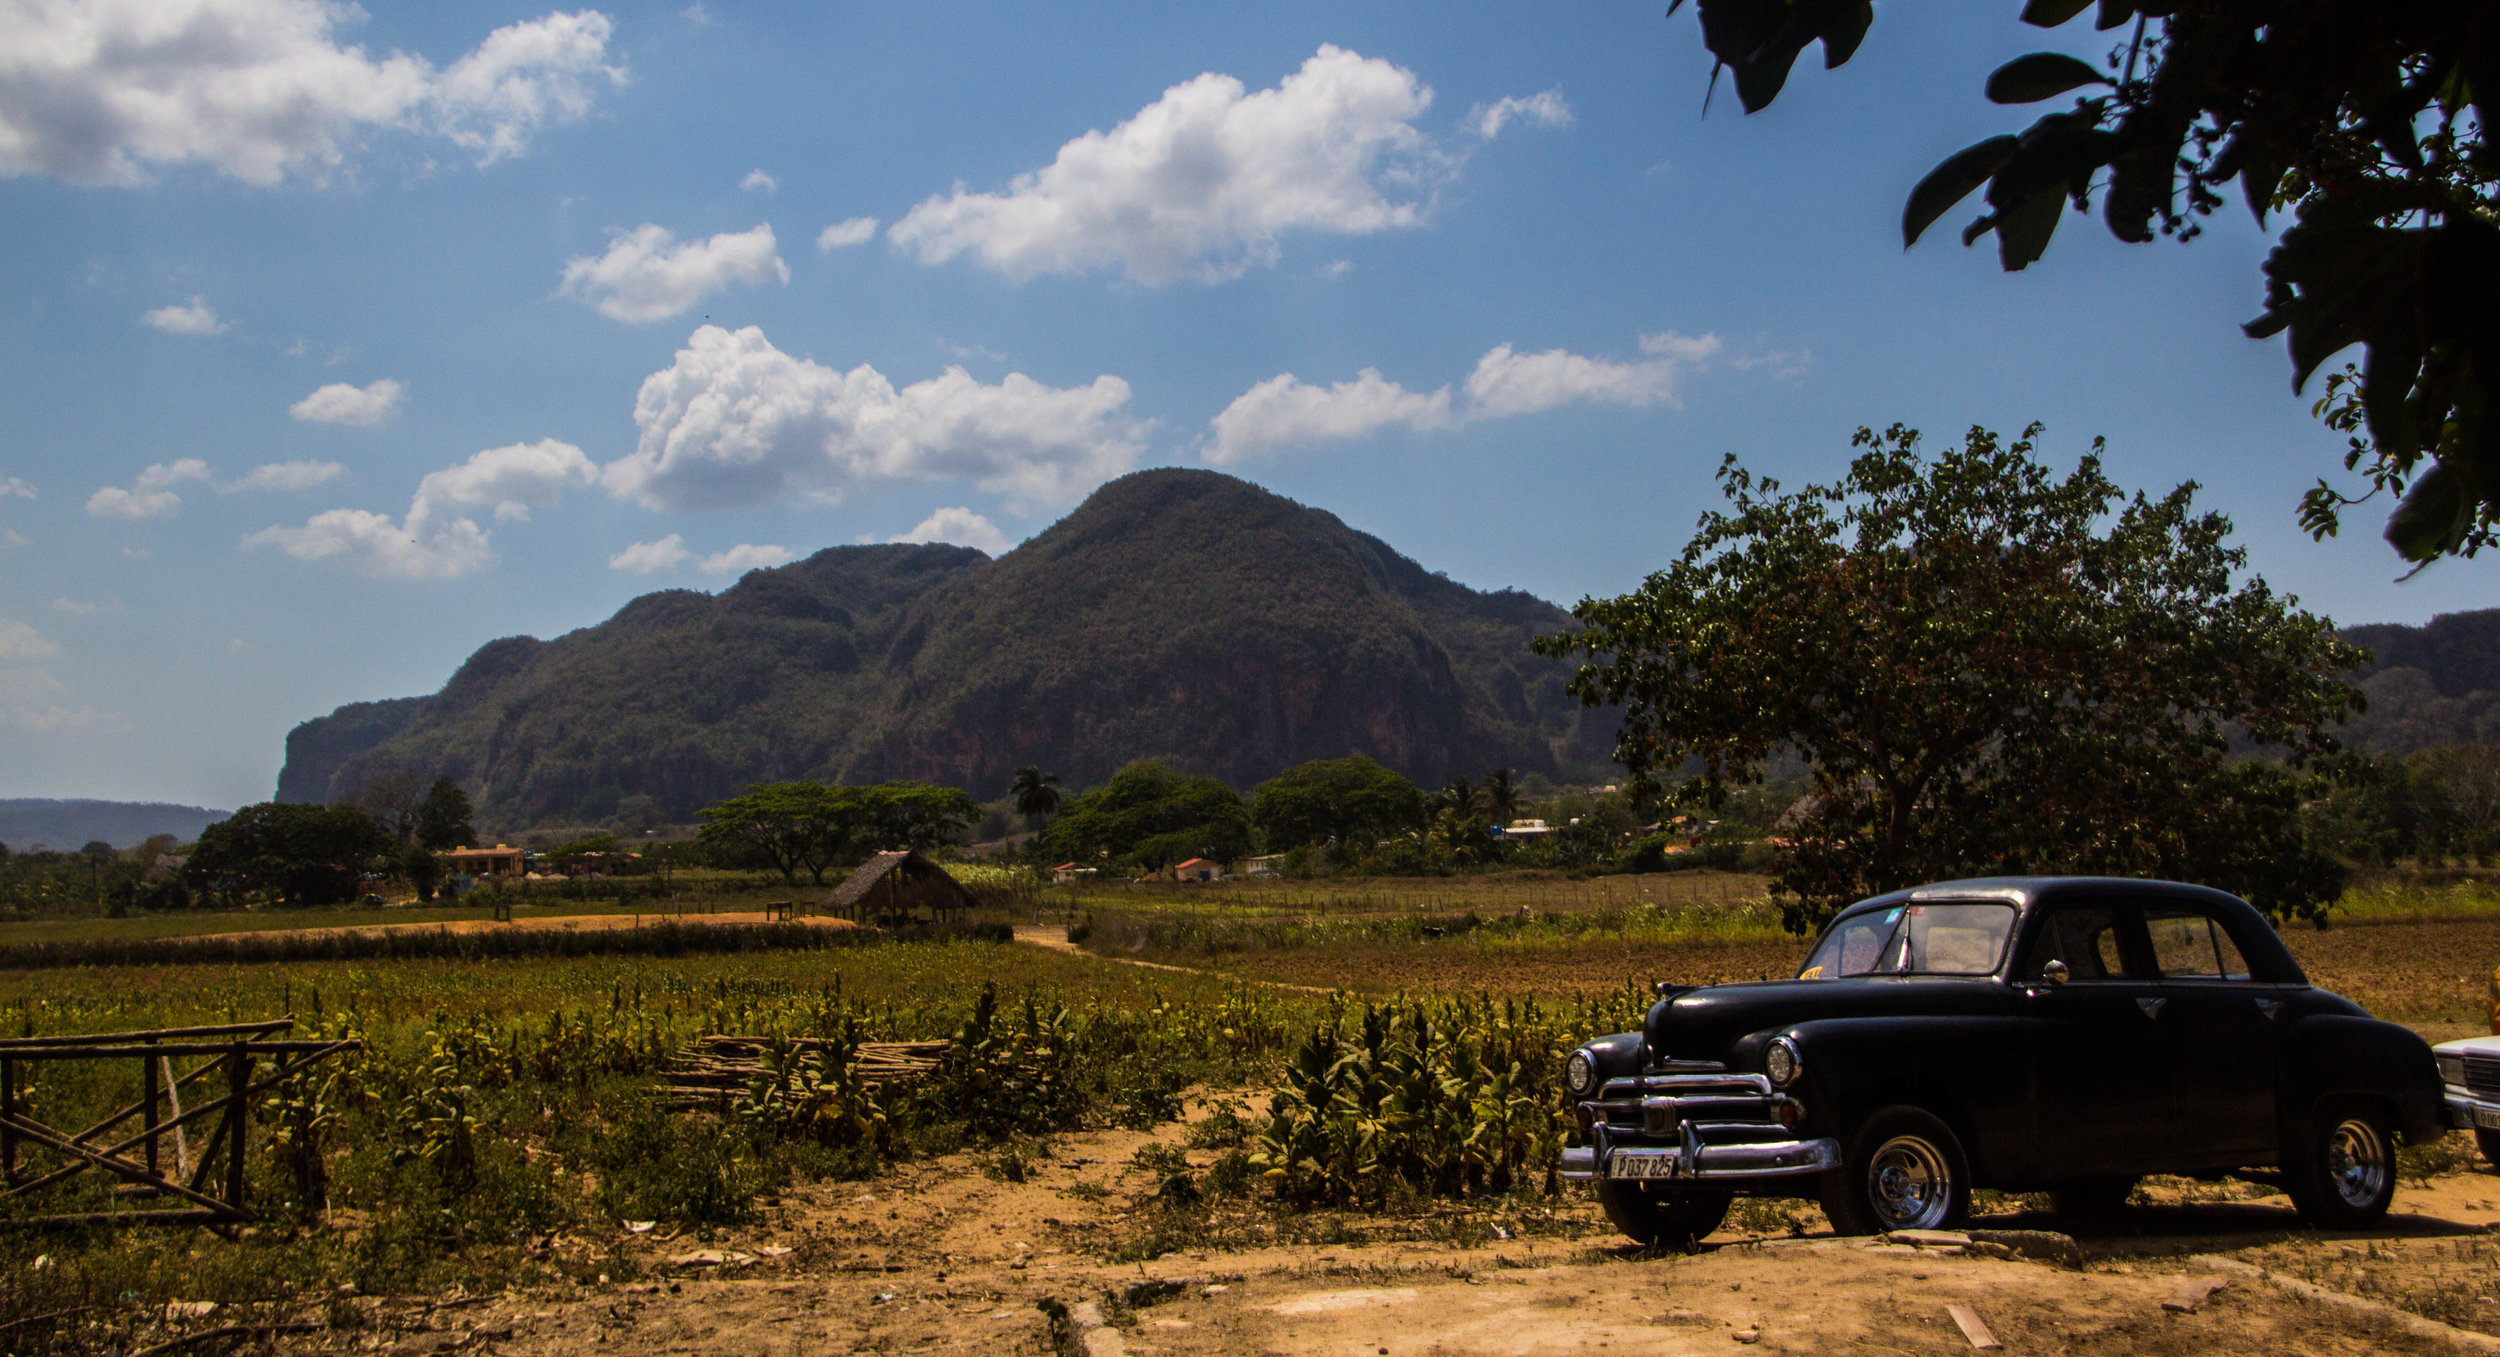 tobacco fields viñales cuba-1-3.jpg